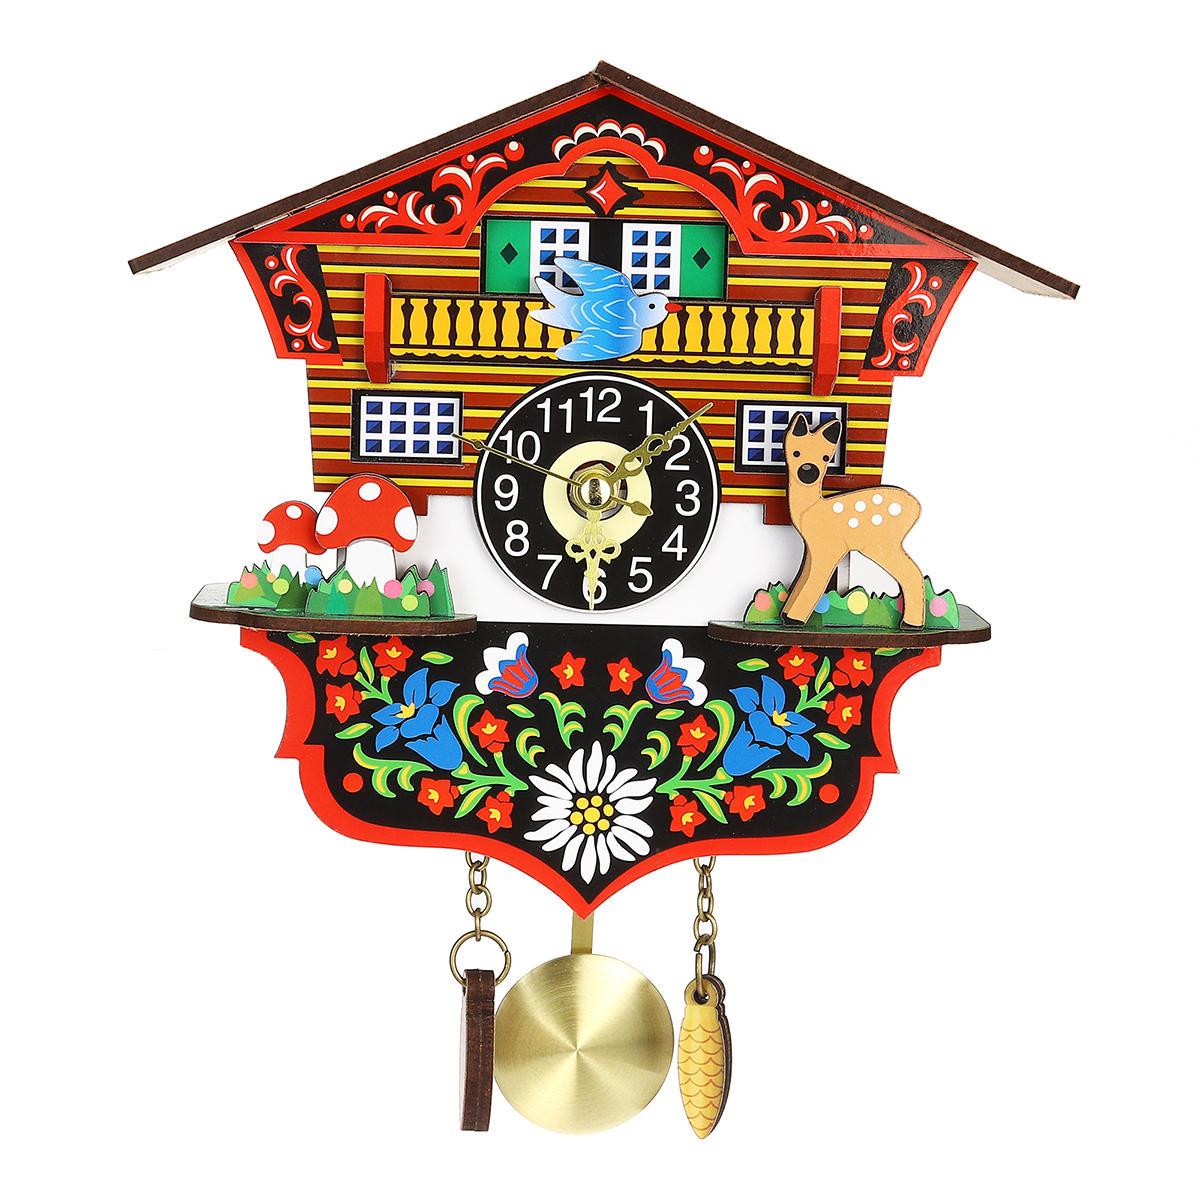 KB-002 Wooden Cuckoo Clock 3D Swing Clock Cartoon Wall Clock Bird Time Bell Alarm Watch